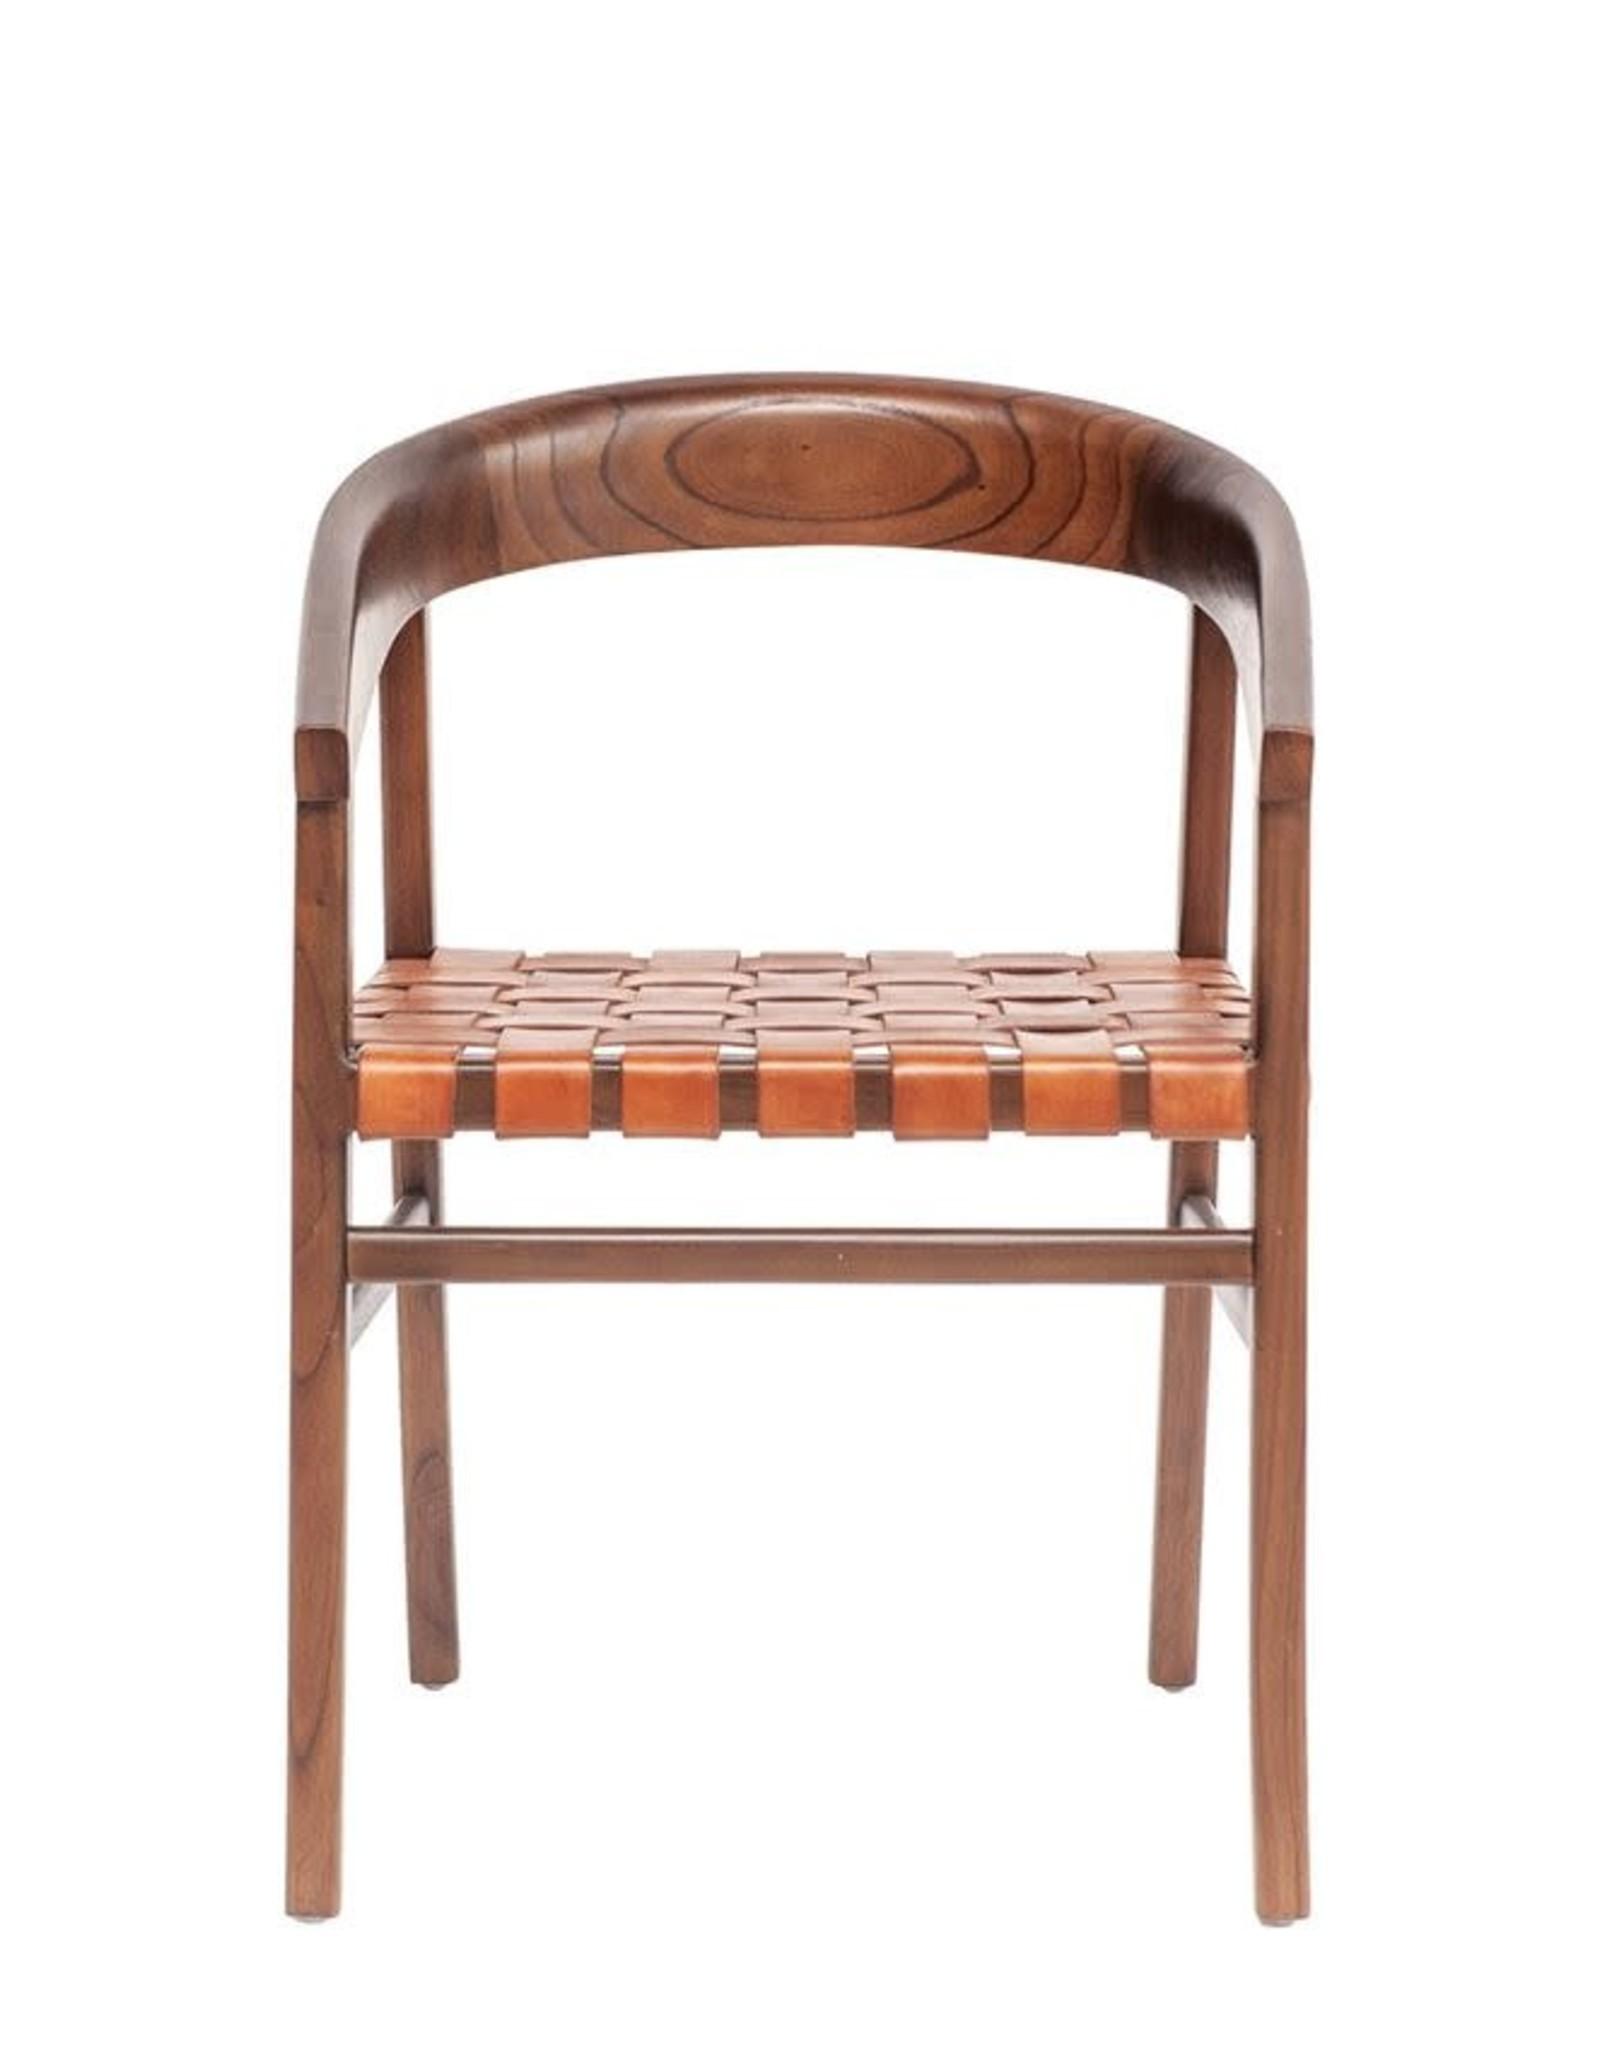 White Cedar & Woven Leather Chair